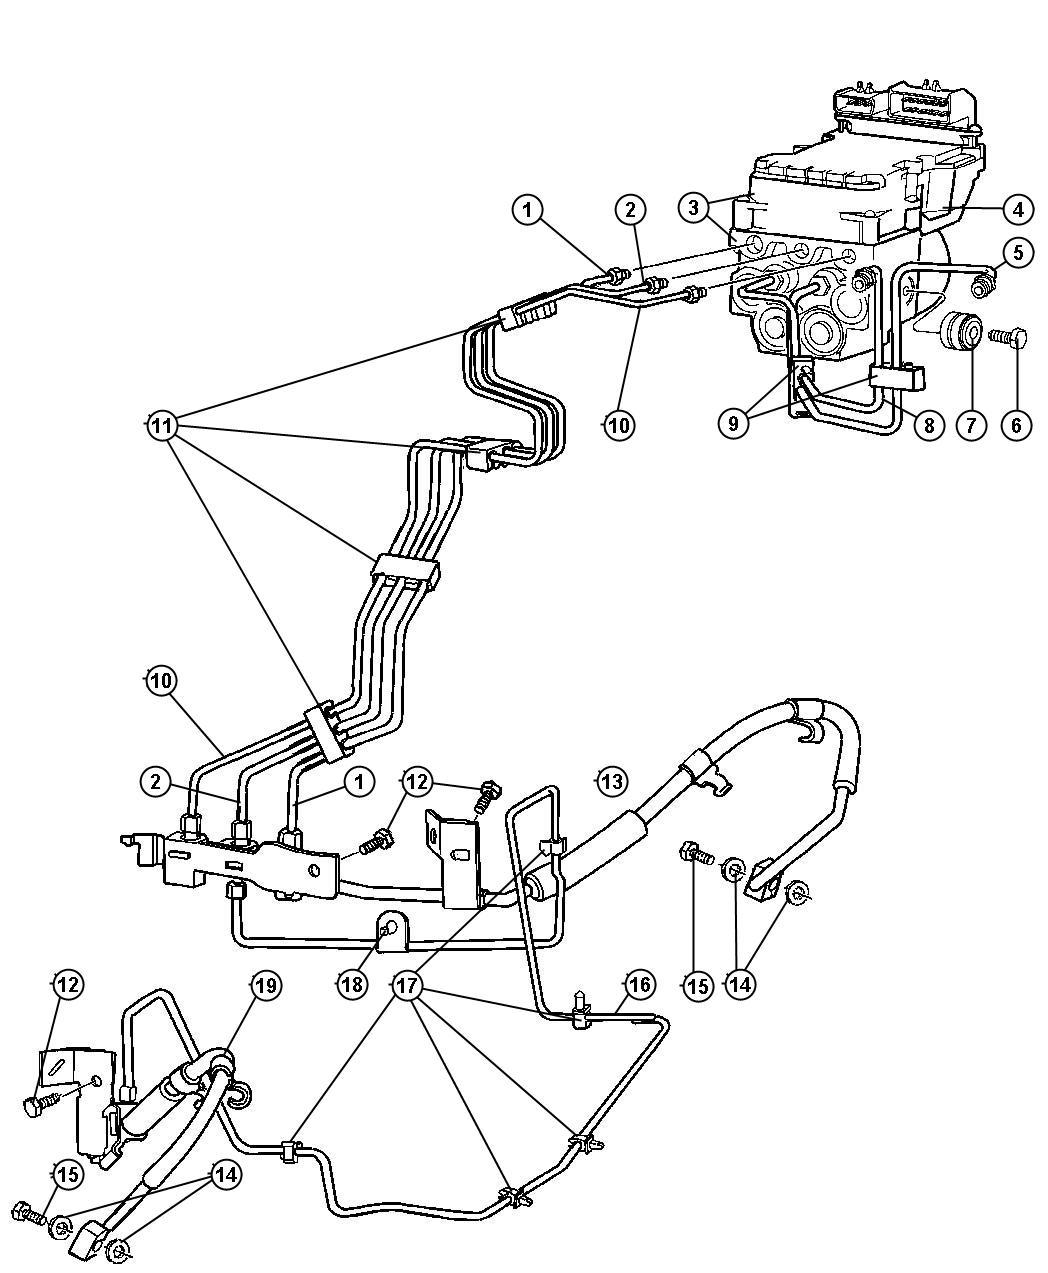 Dodge Ram 2500 Control unit. Anti-lock brake. Brakes